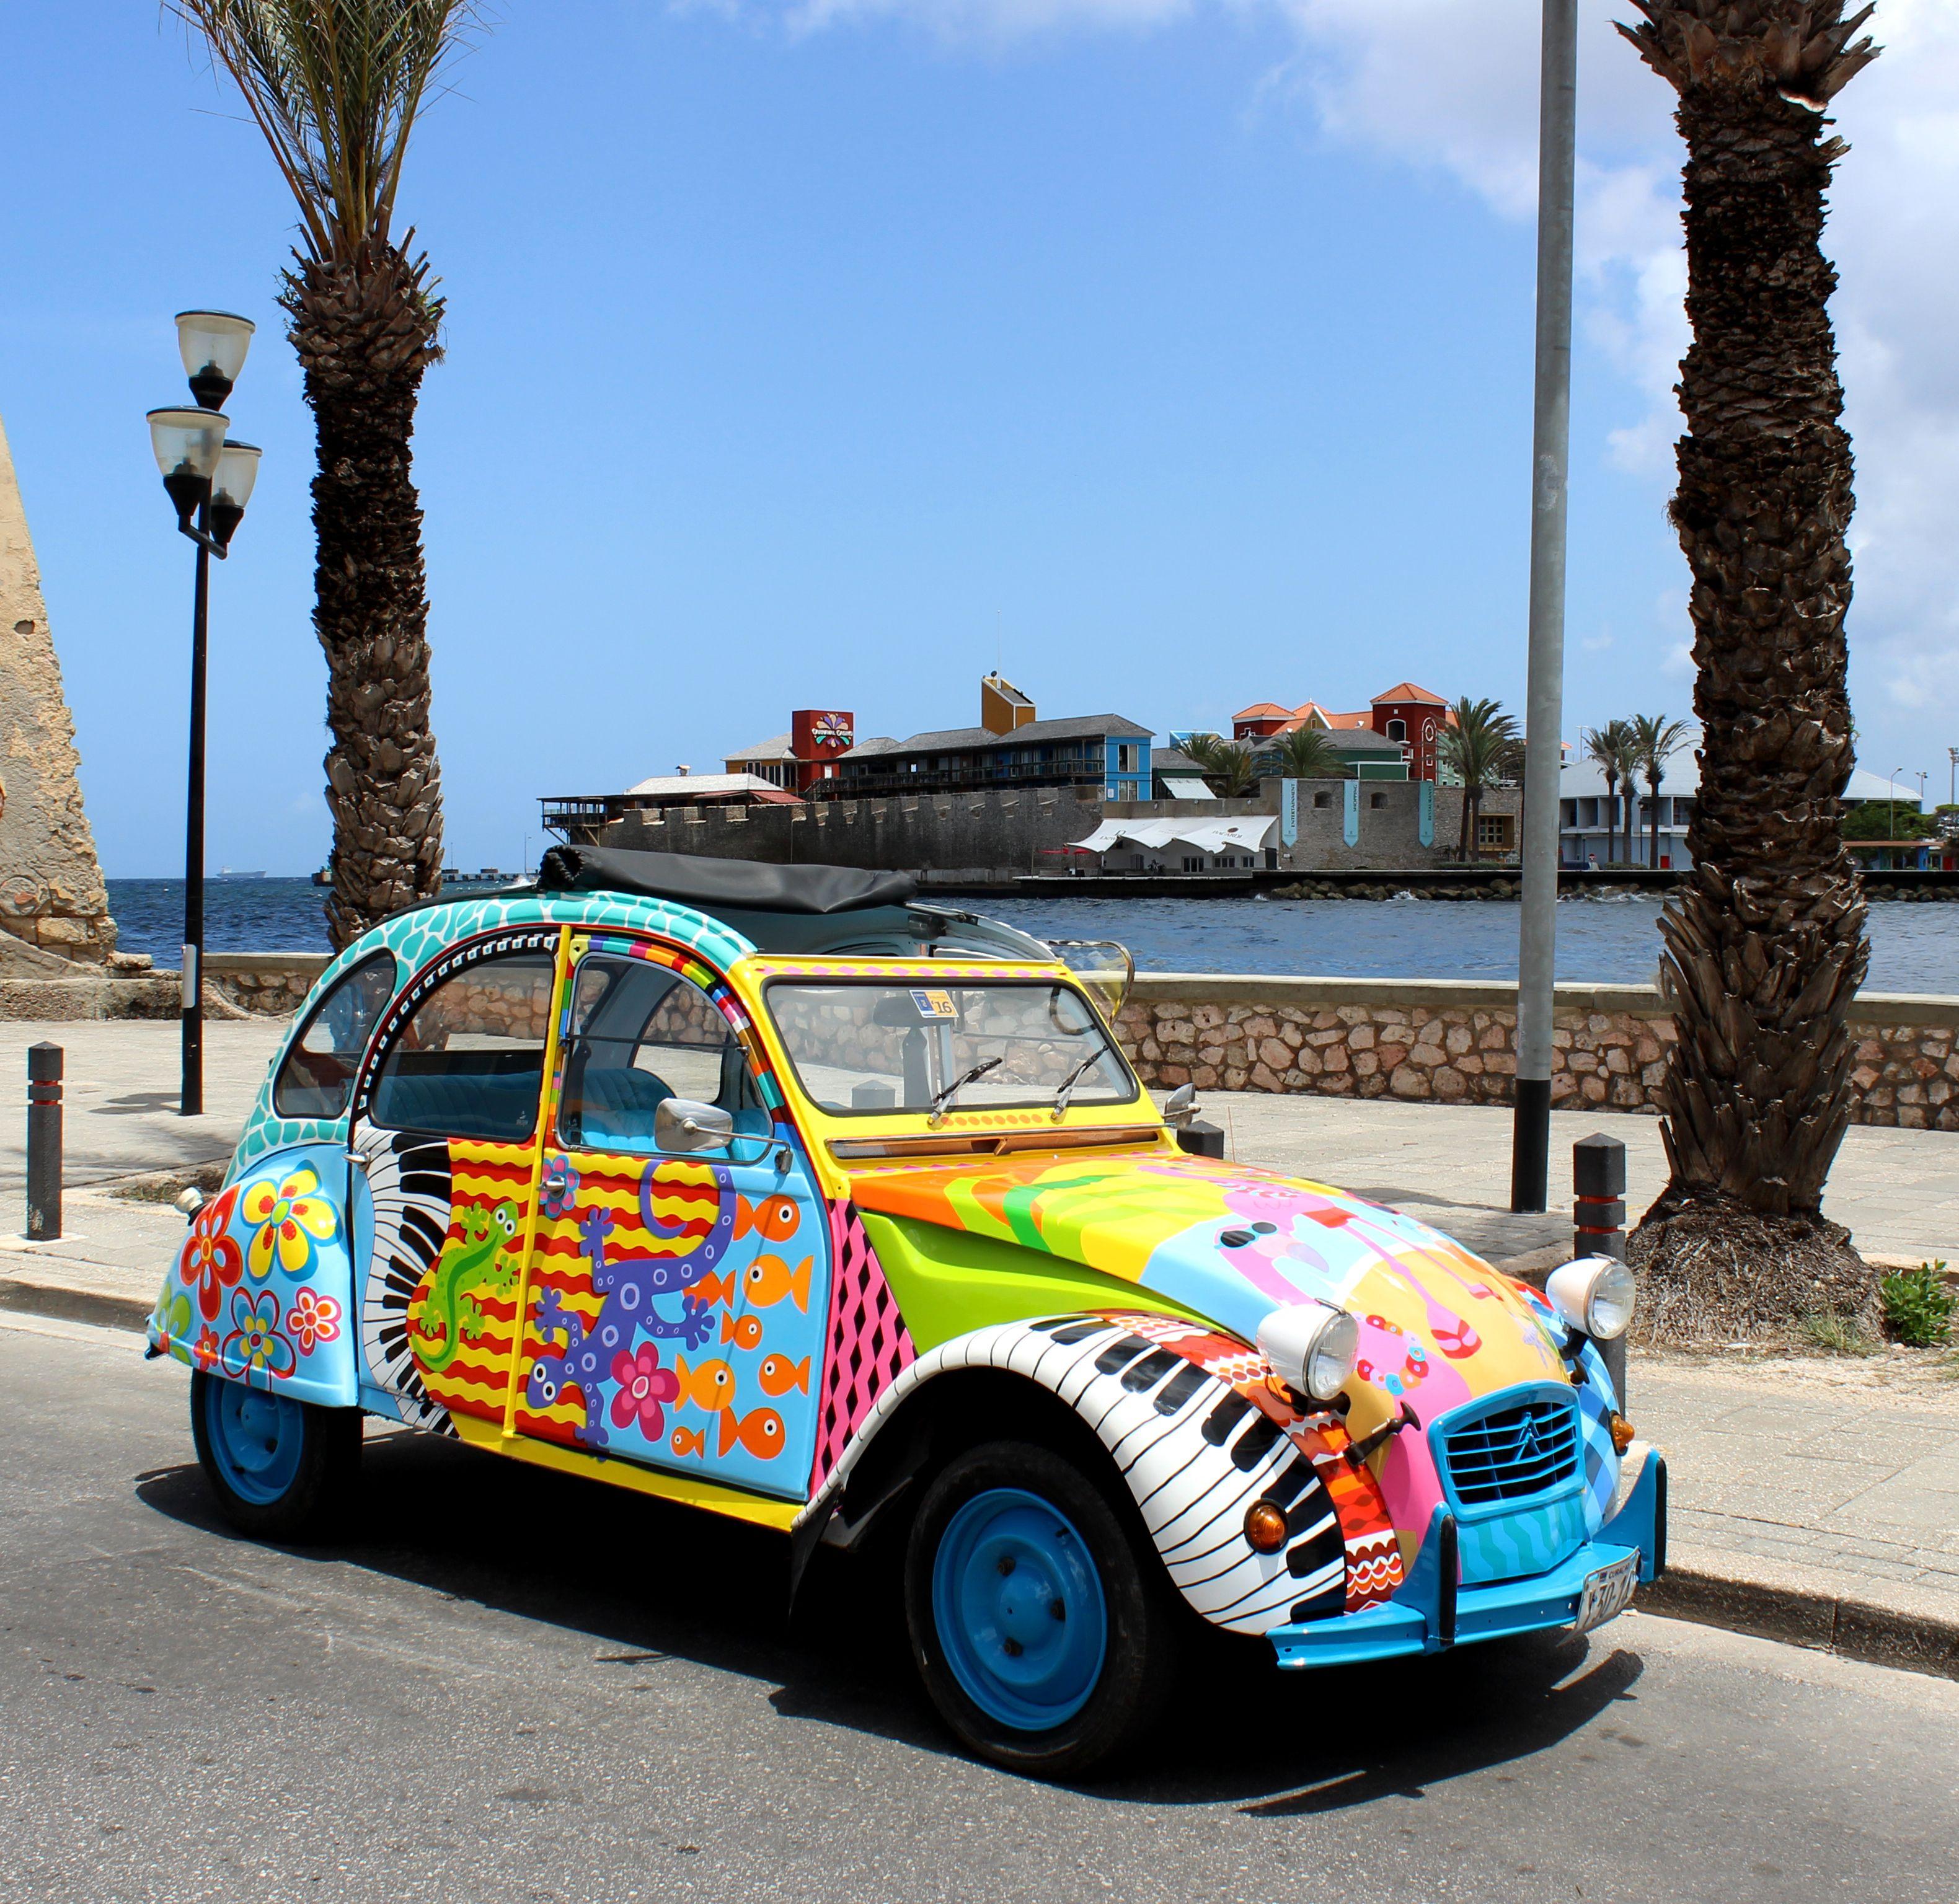 Handelskade Curacao, Riffort, Duck, Caribbean art, colorfull Willemstad, Mirjam Griffioen